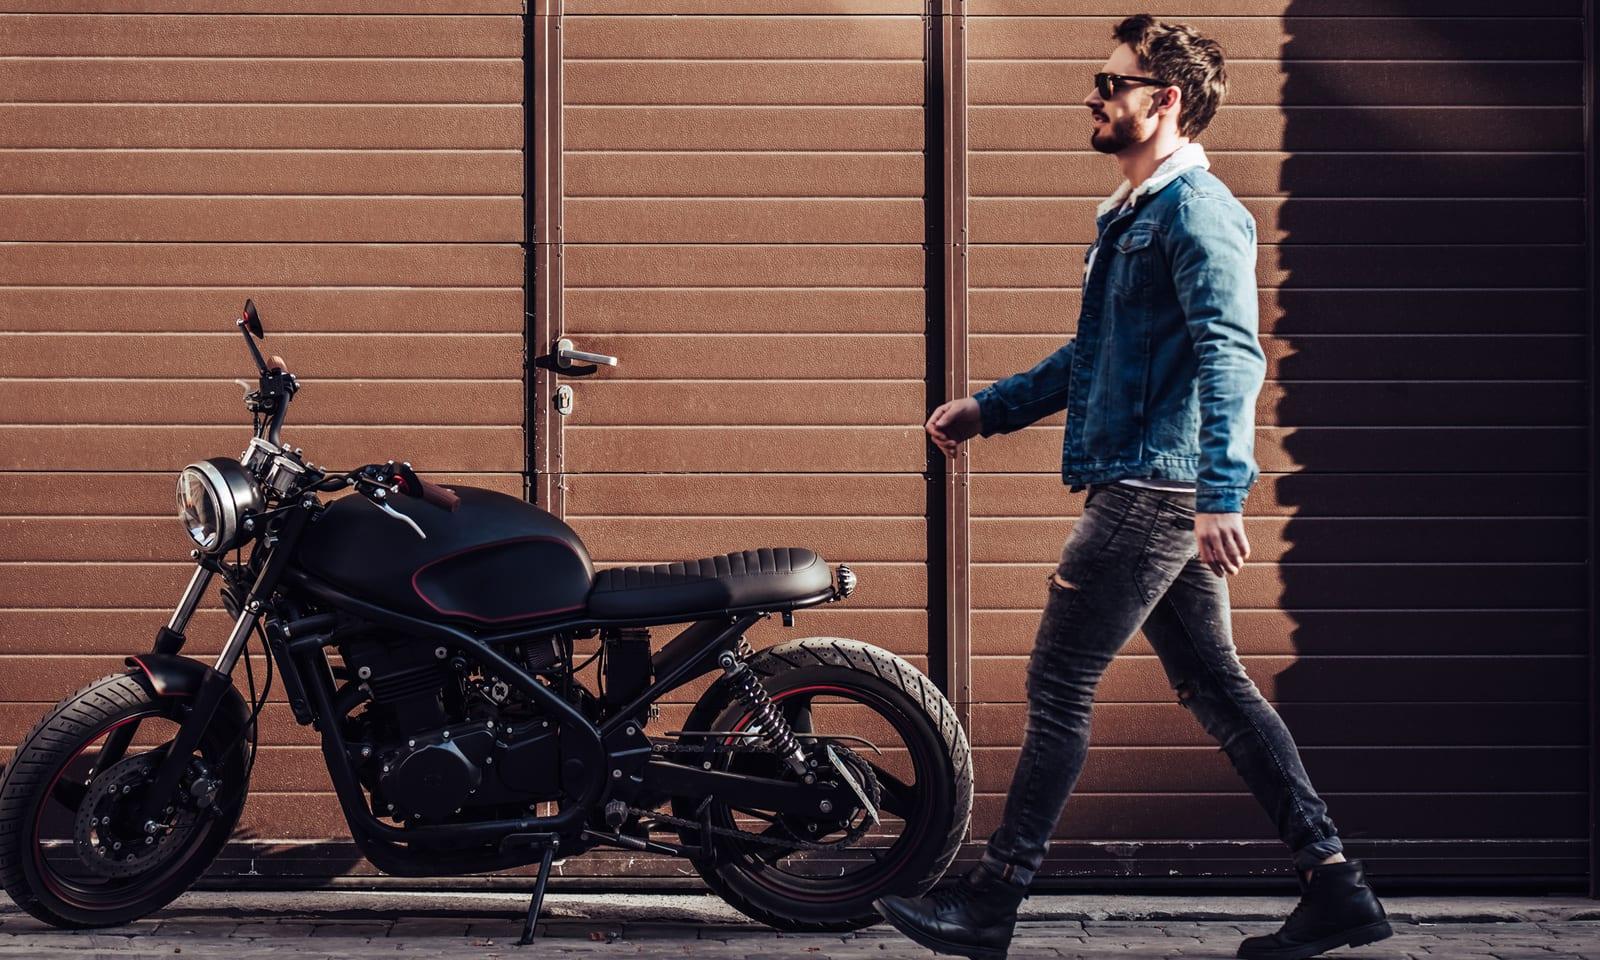 Best Motorcycle Boots 2019 10 Best Motorcycle Boots [ 2019 Reviews ]   Shoe Adviser